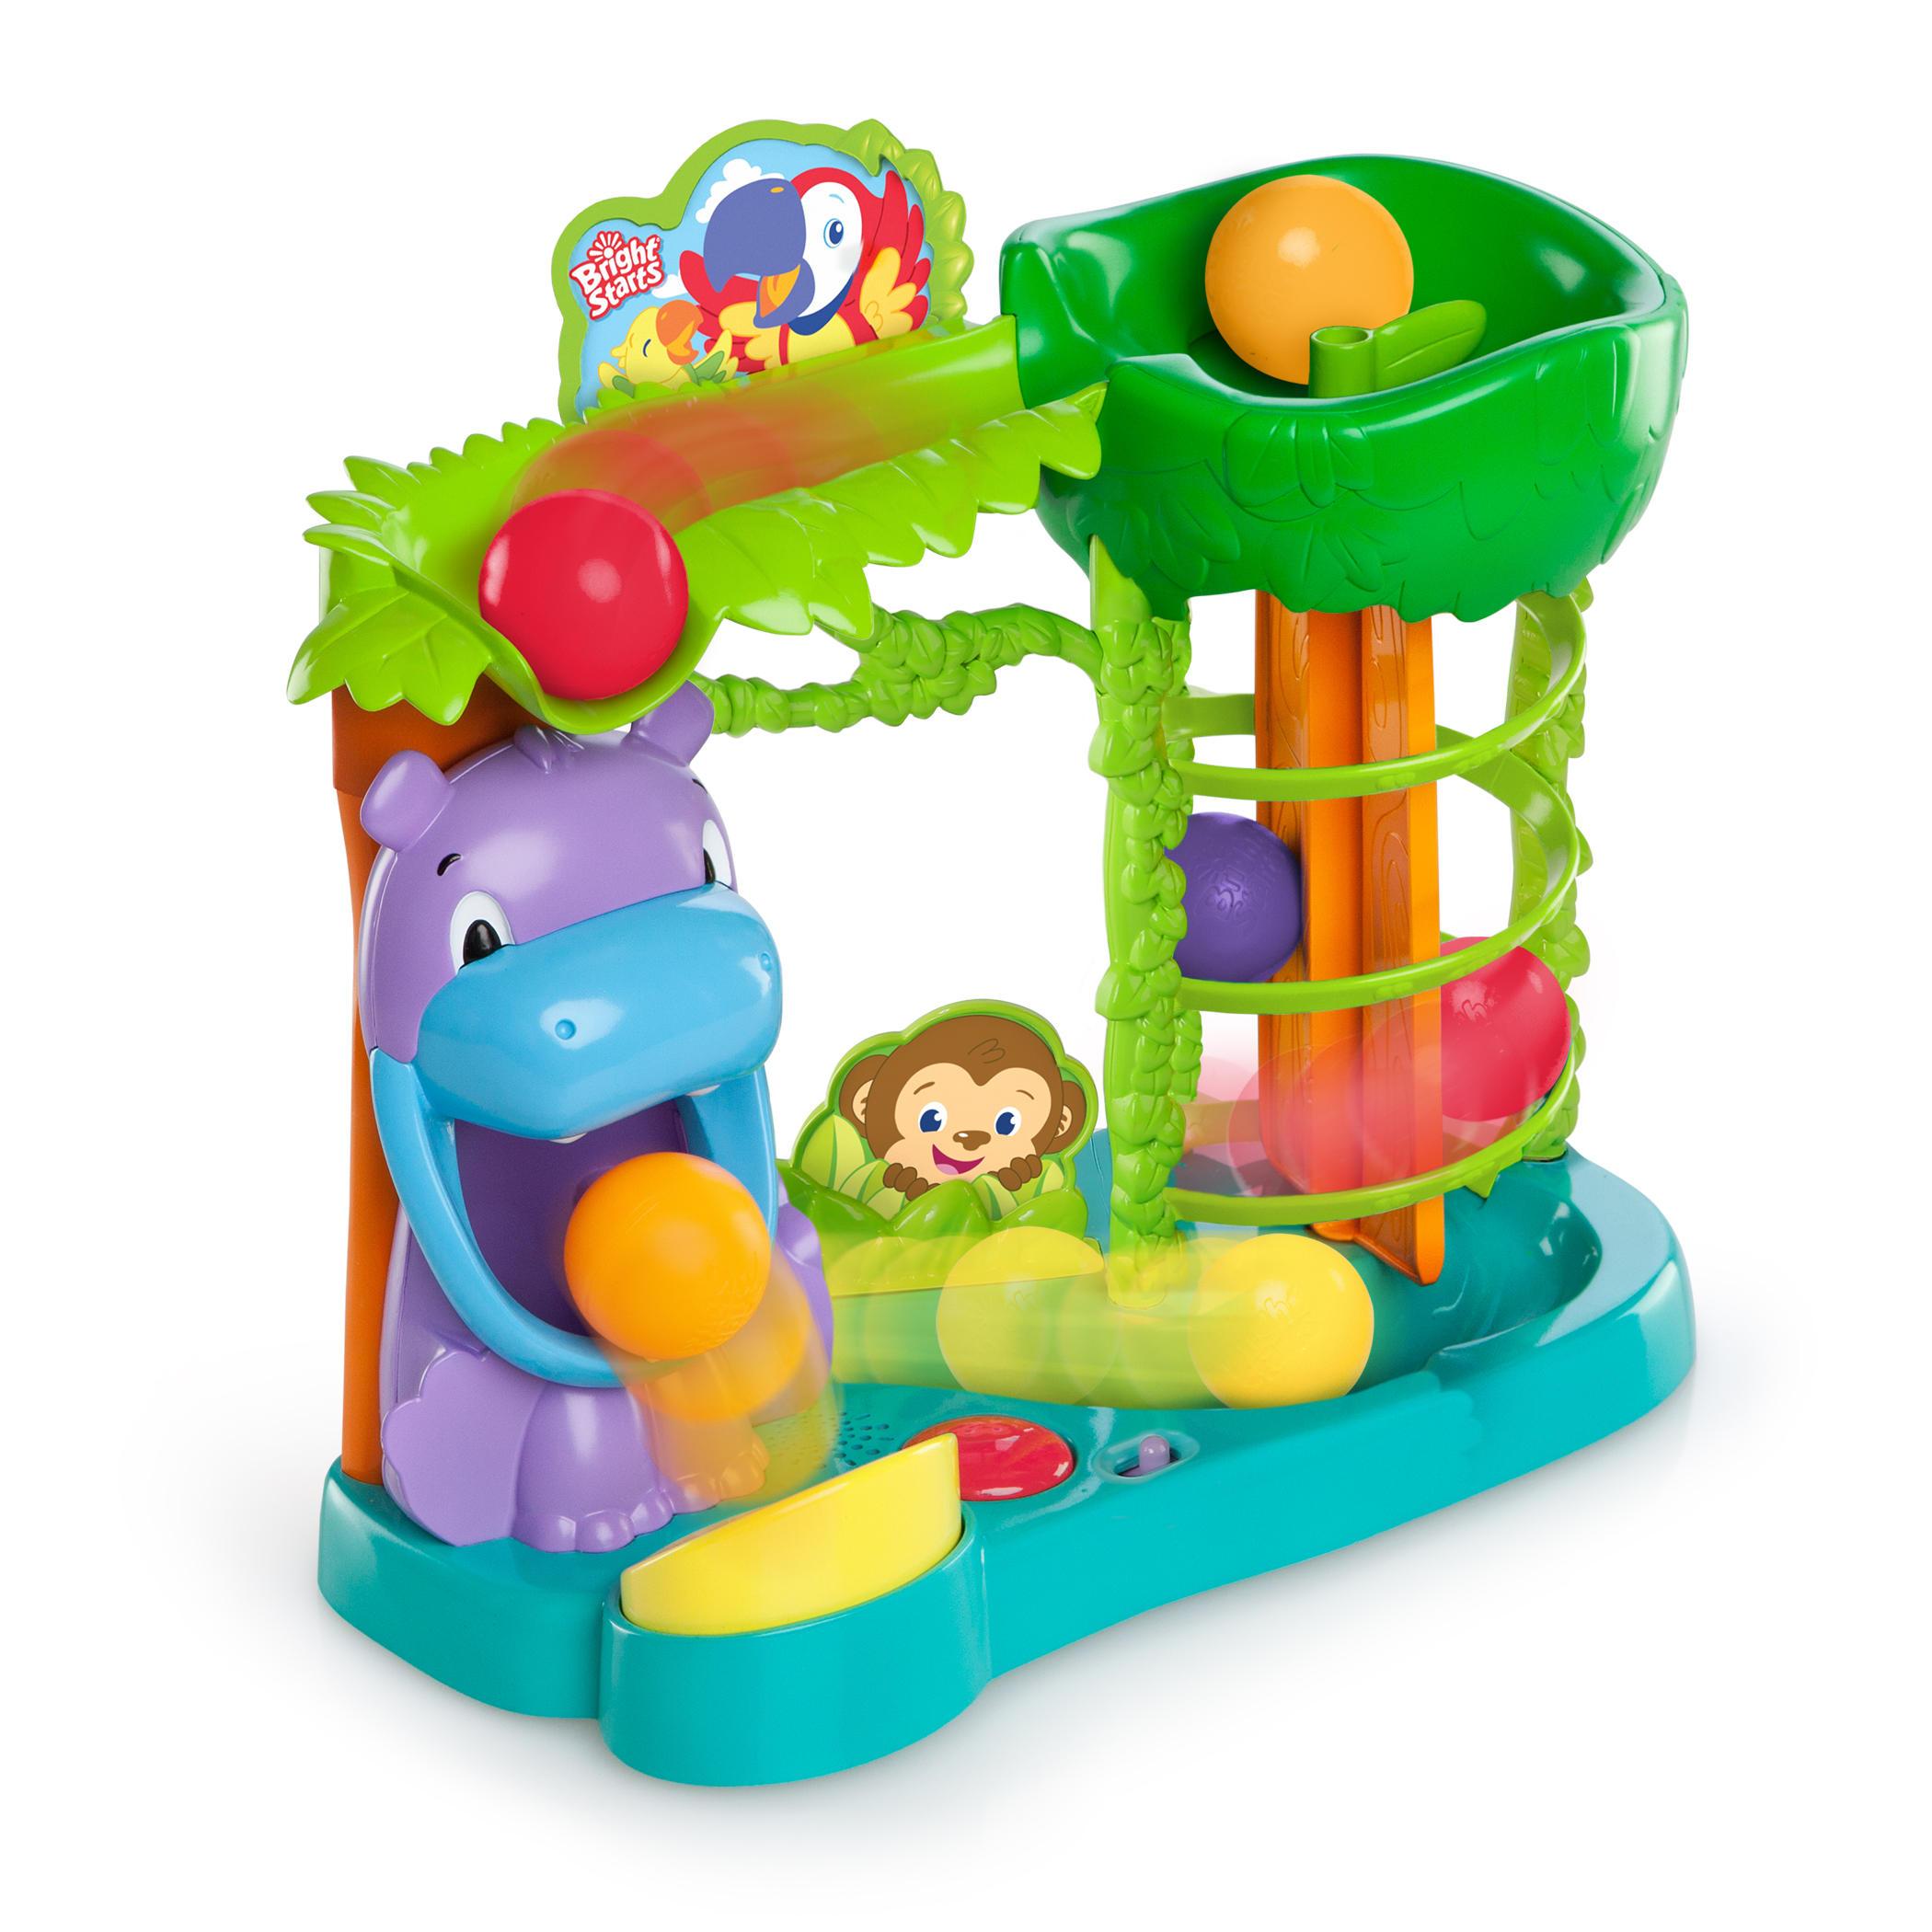 Bright Starts Jungle Fun Ball Climber Toy